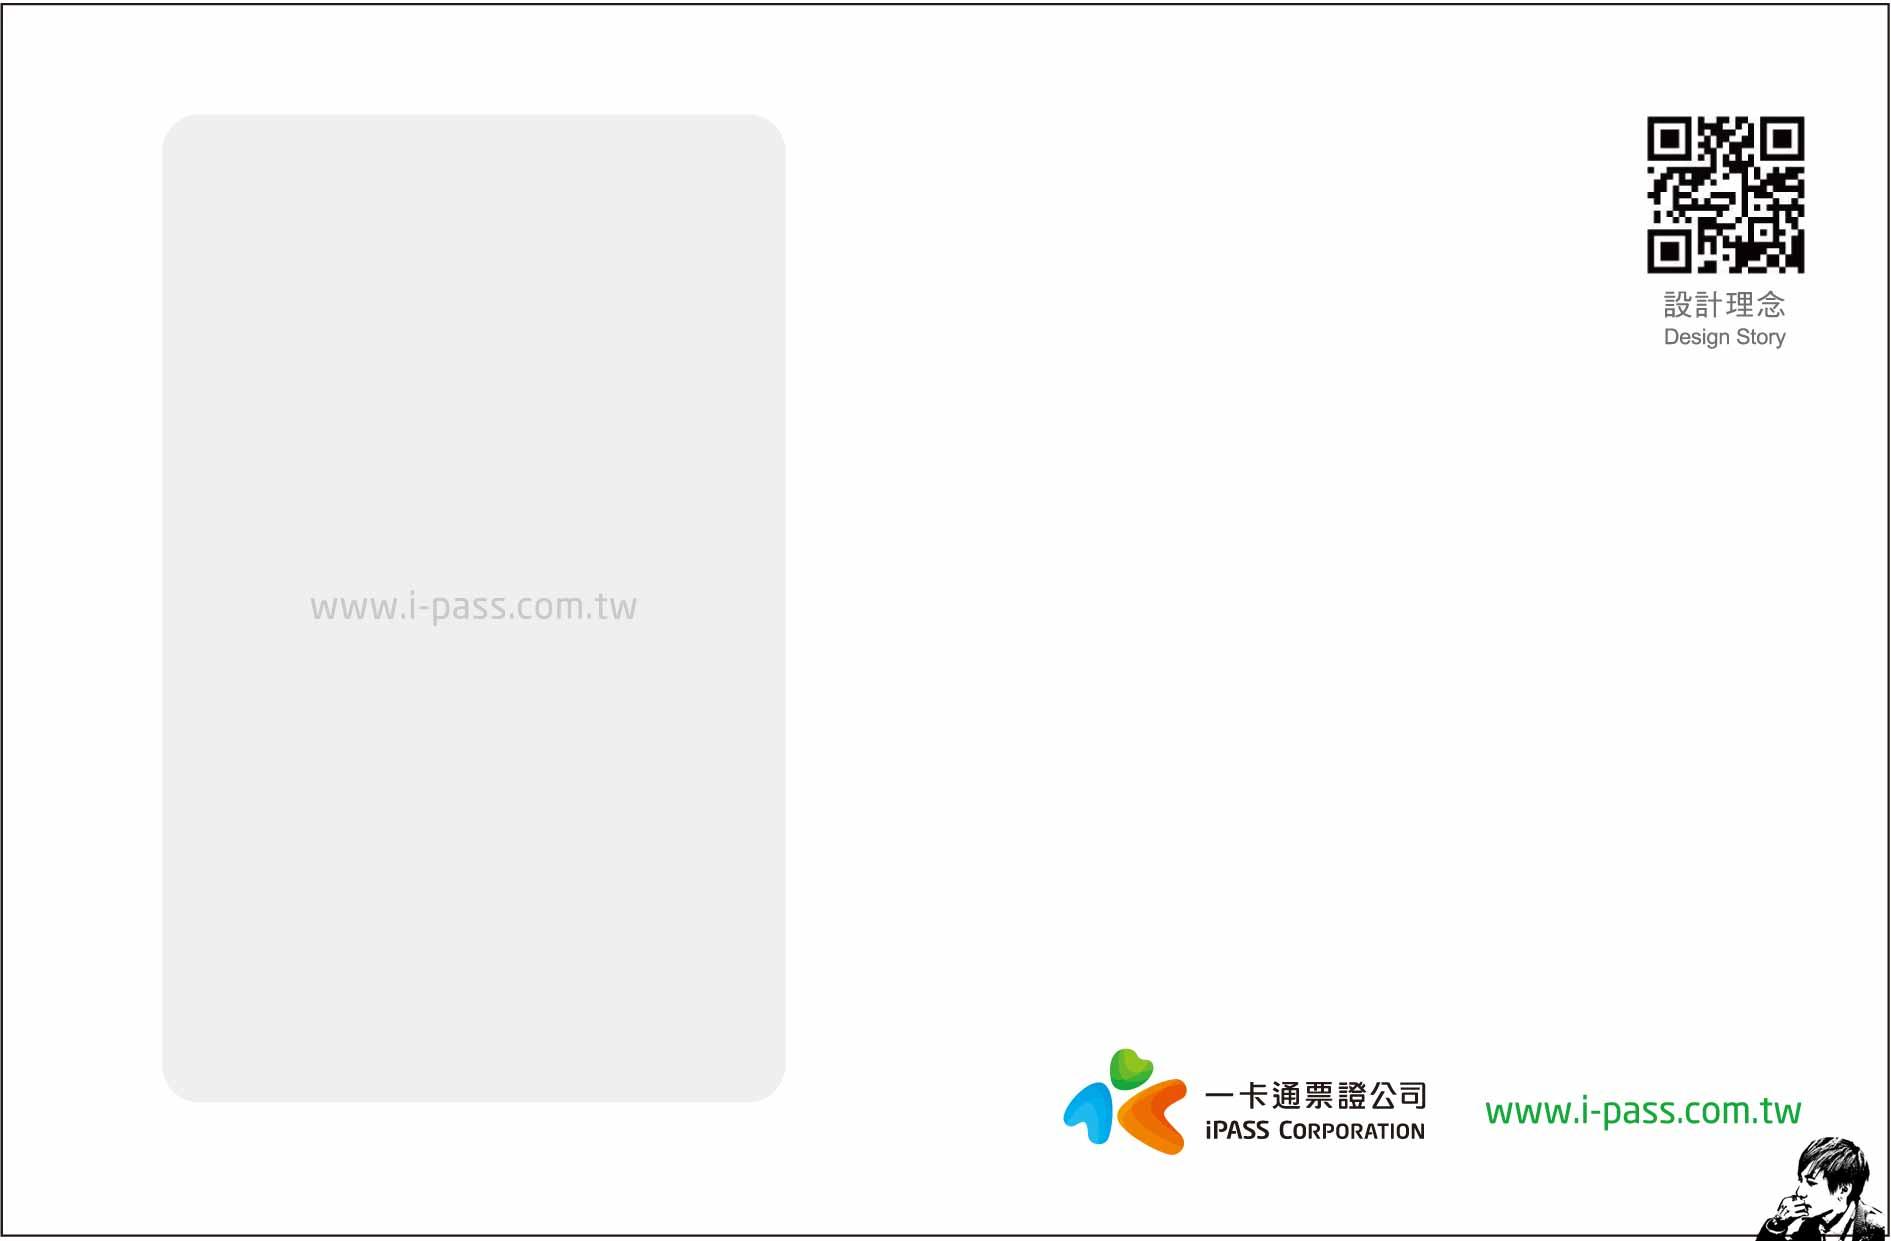 iPASS一卡通設計-hotelscombined-曹郡梃